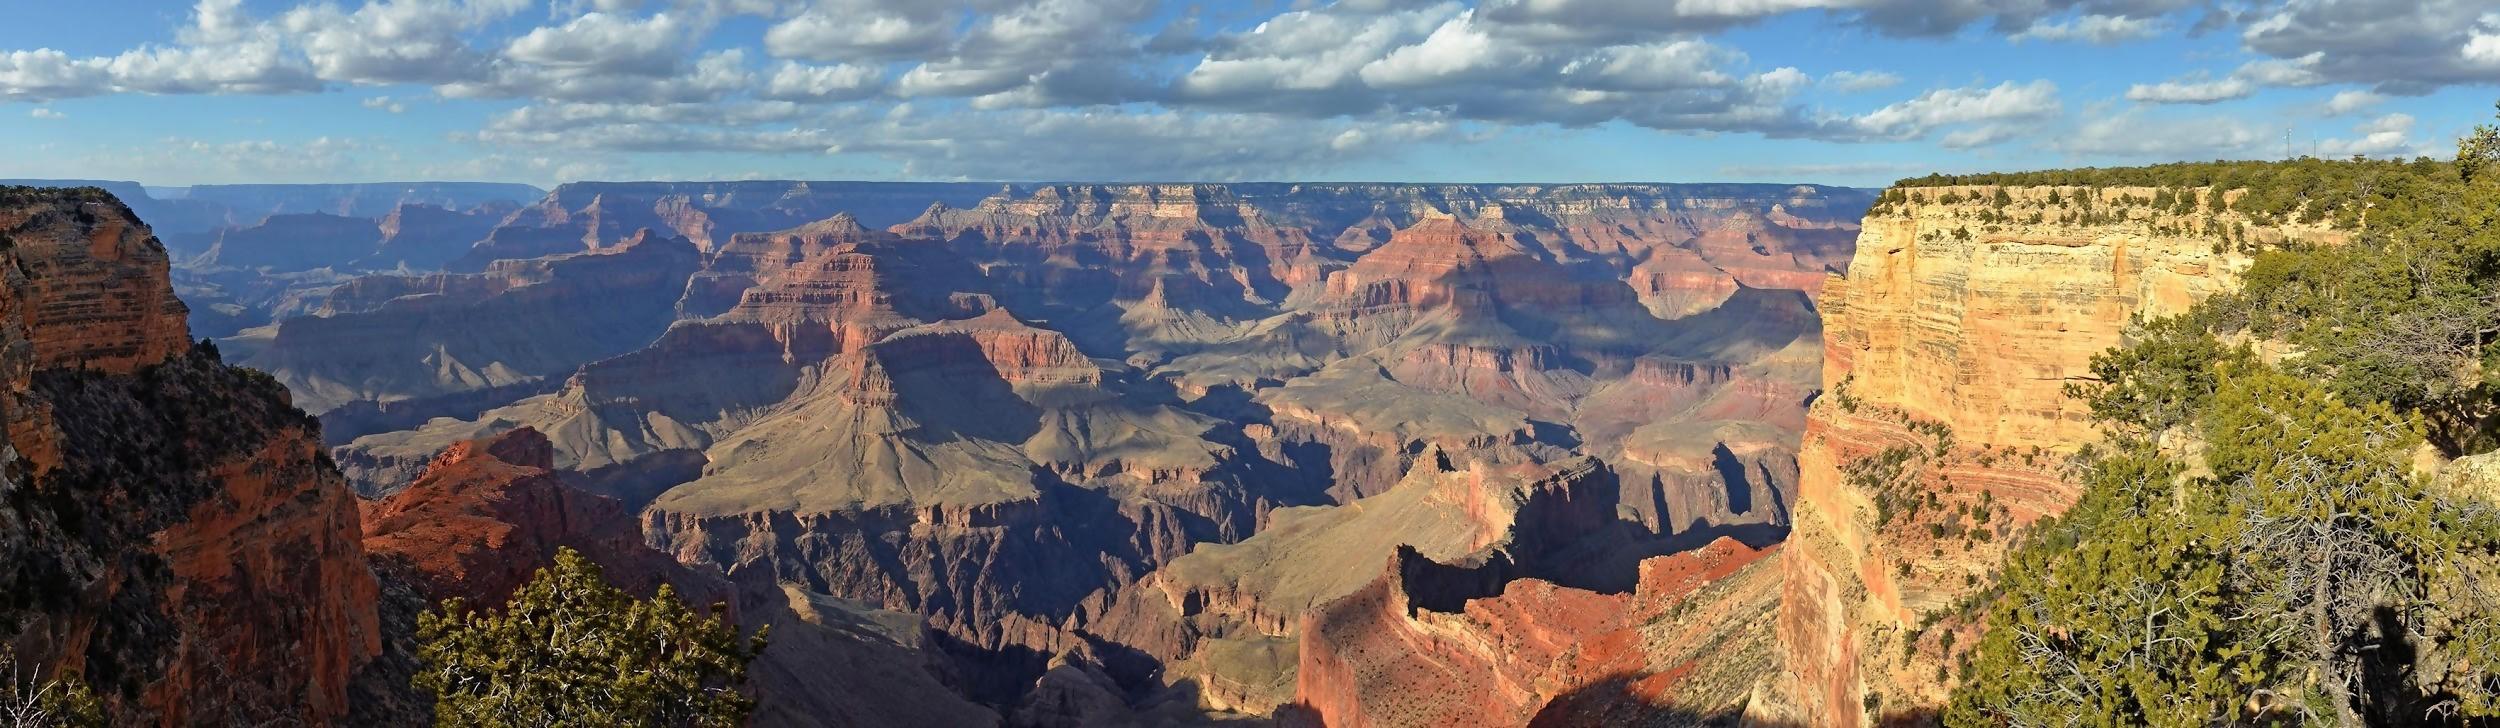 Grand Canyon Holidays